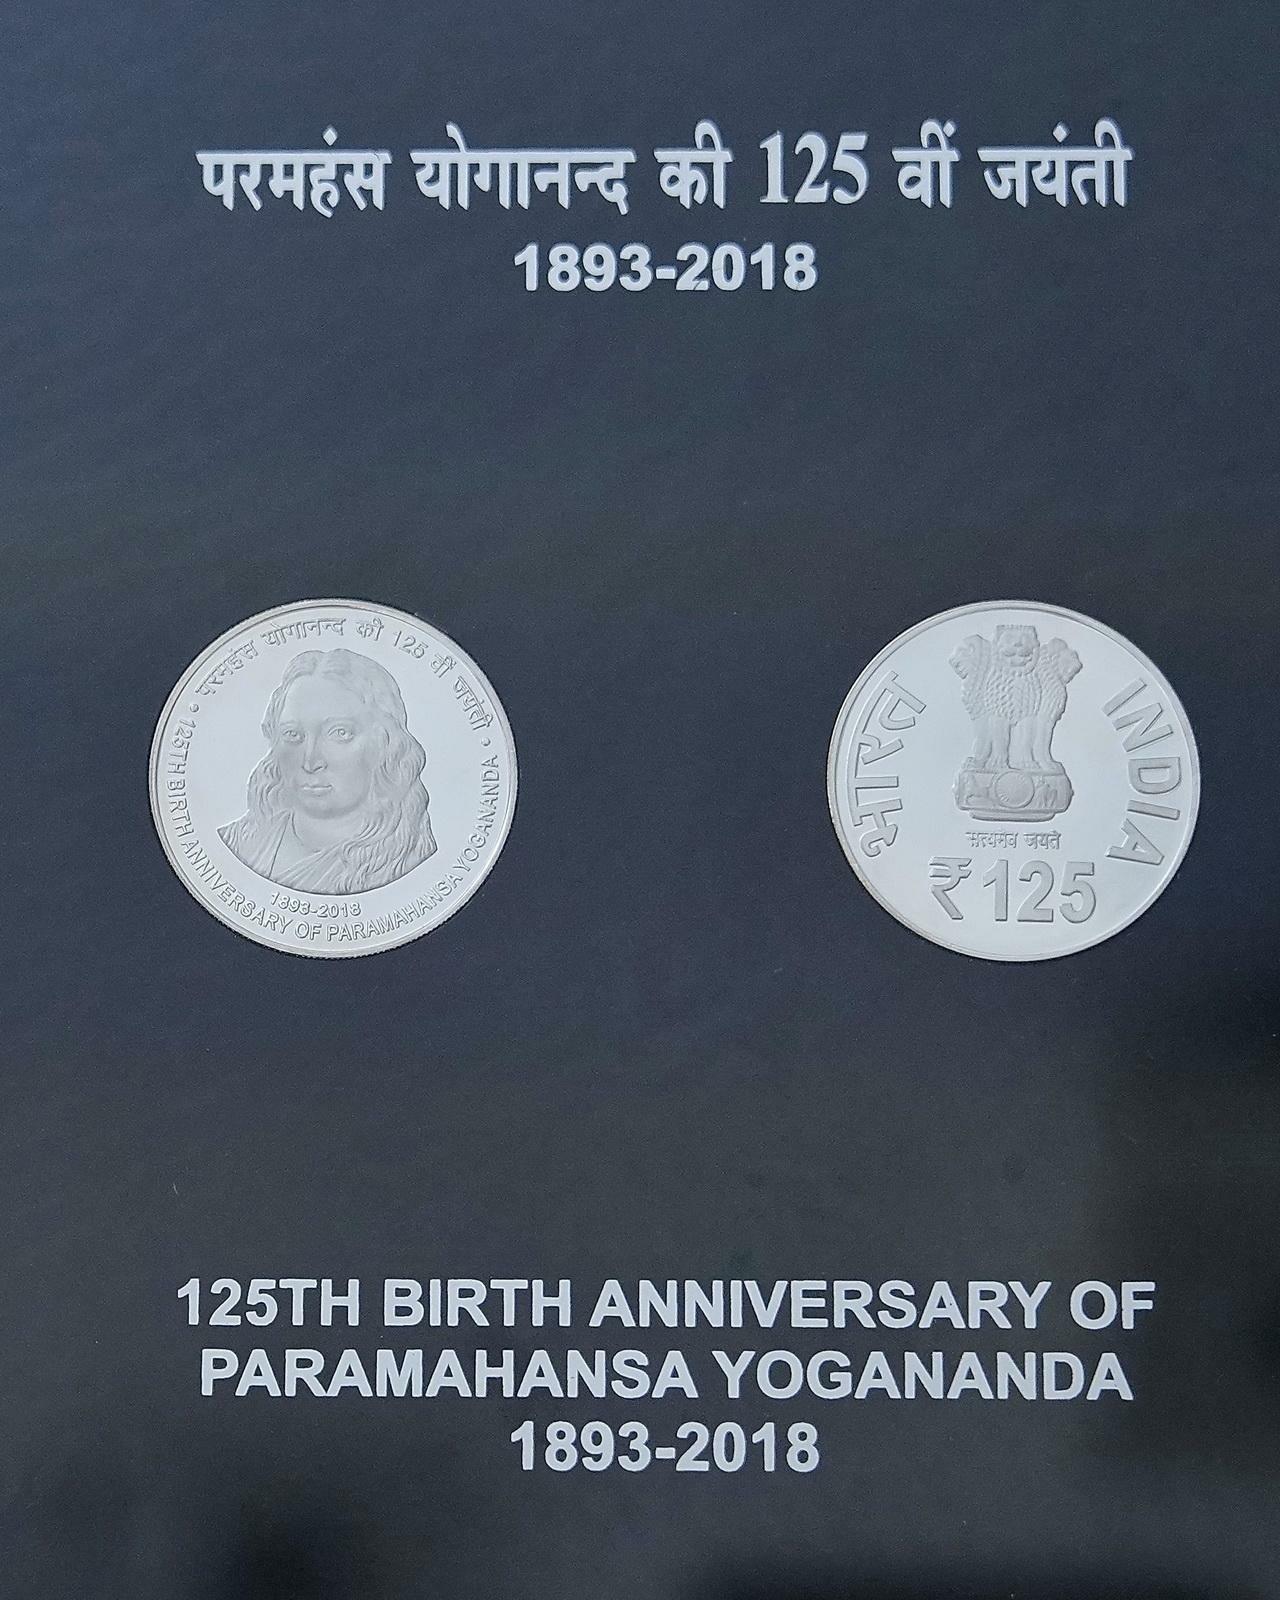 Paramahansa Yogananda Commemorative Coin